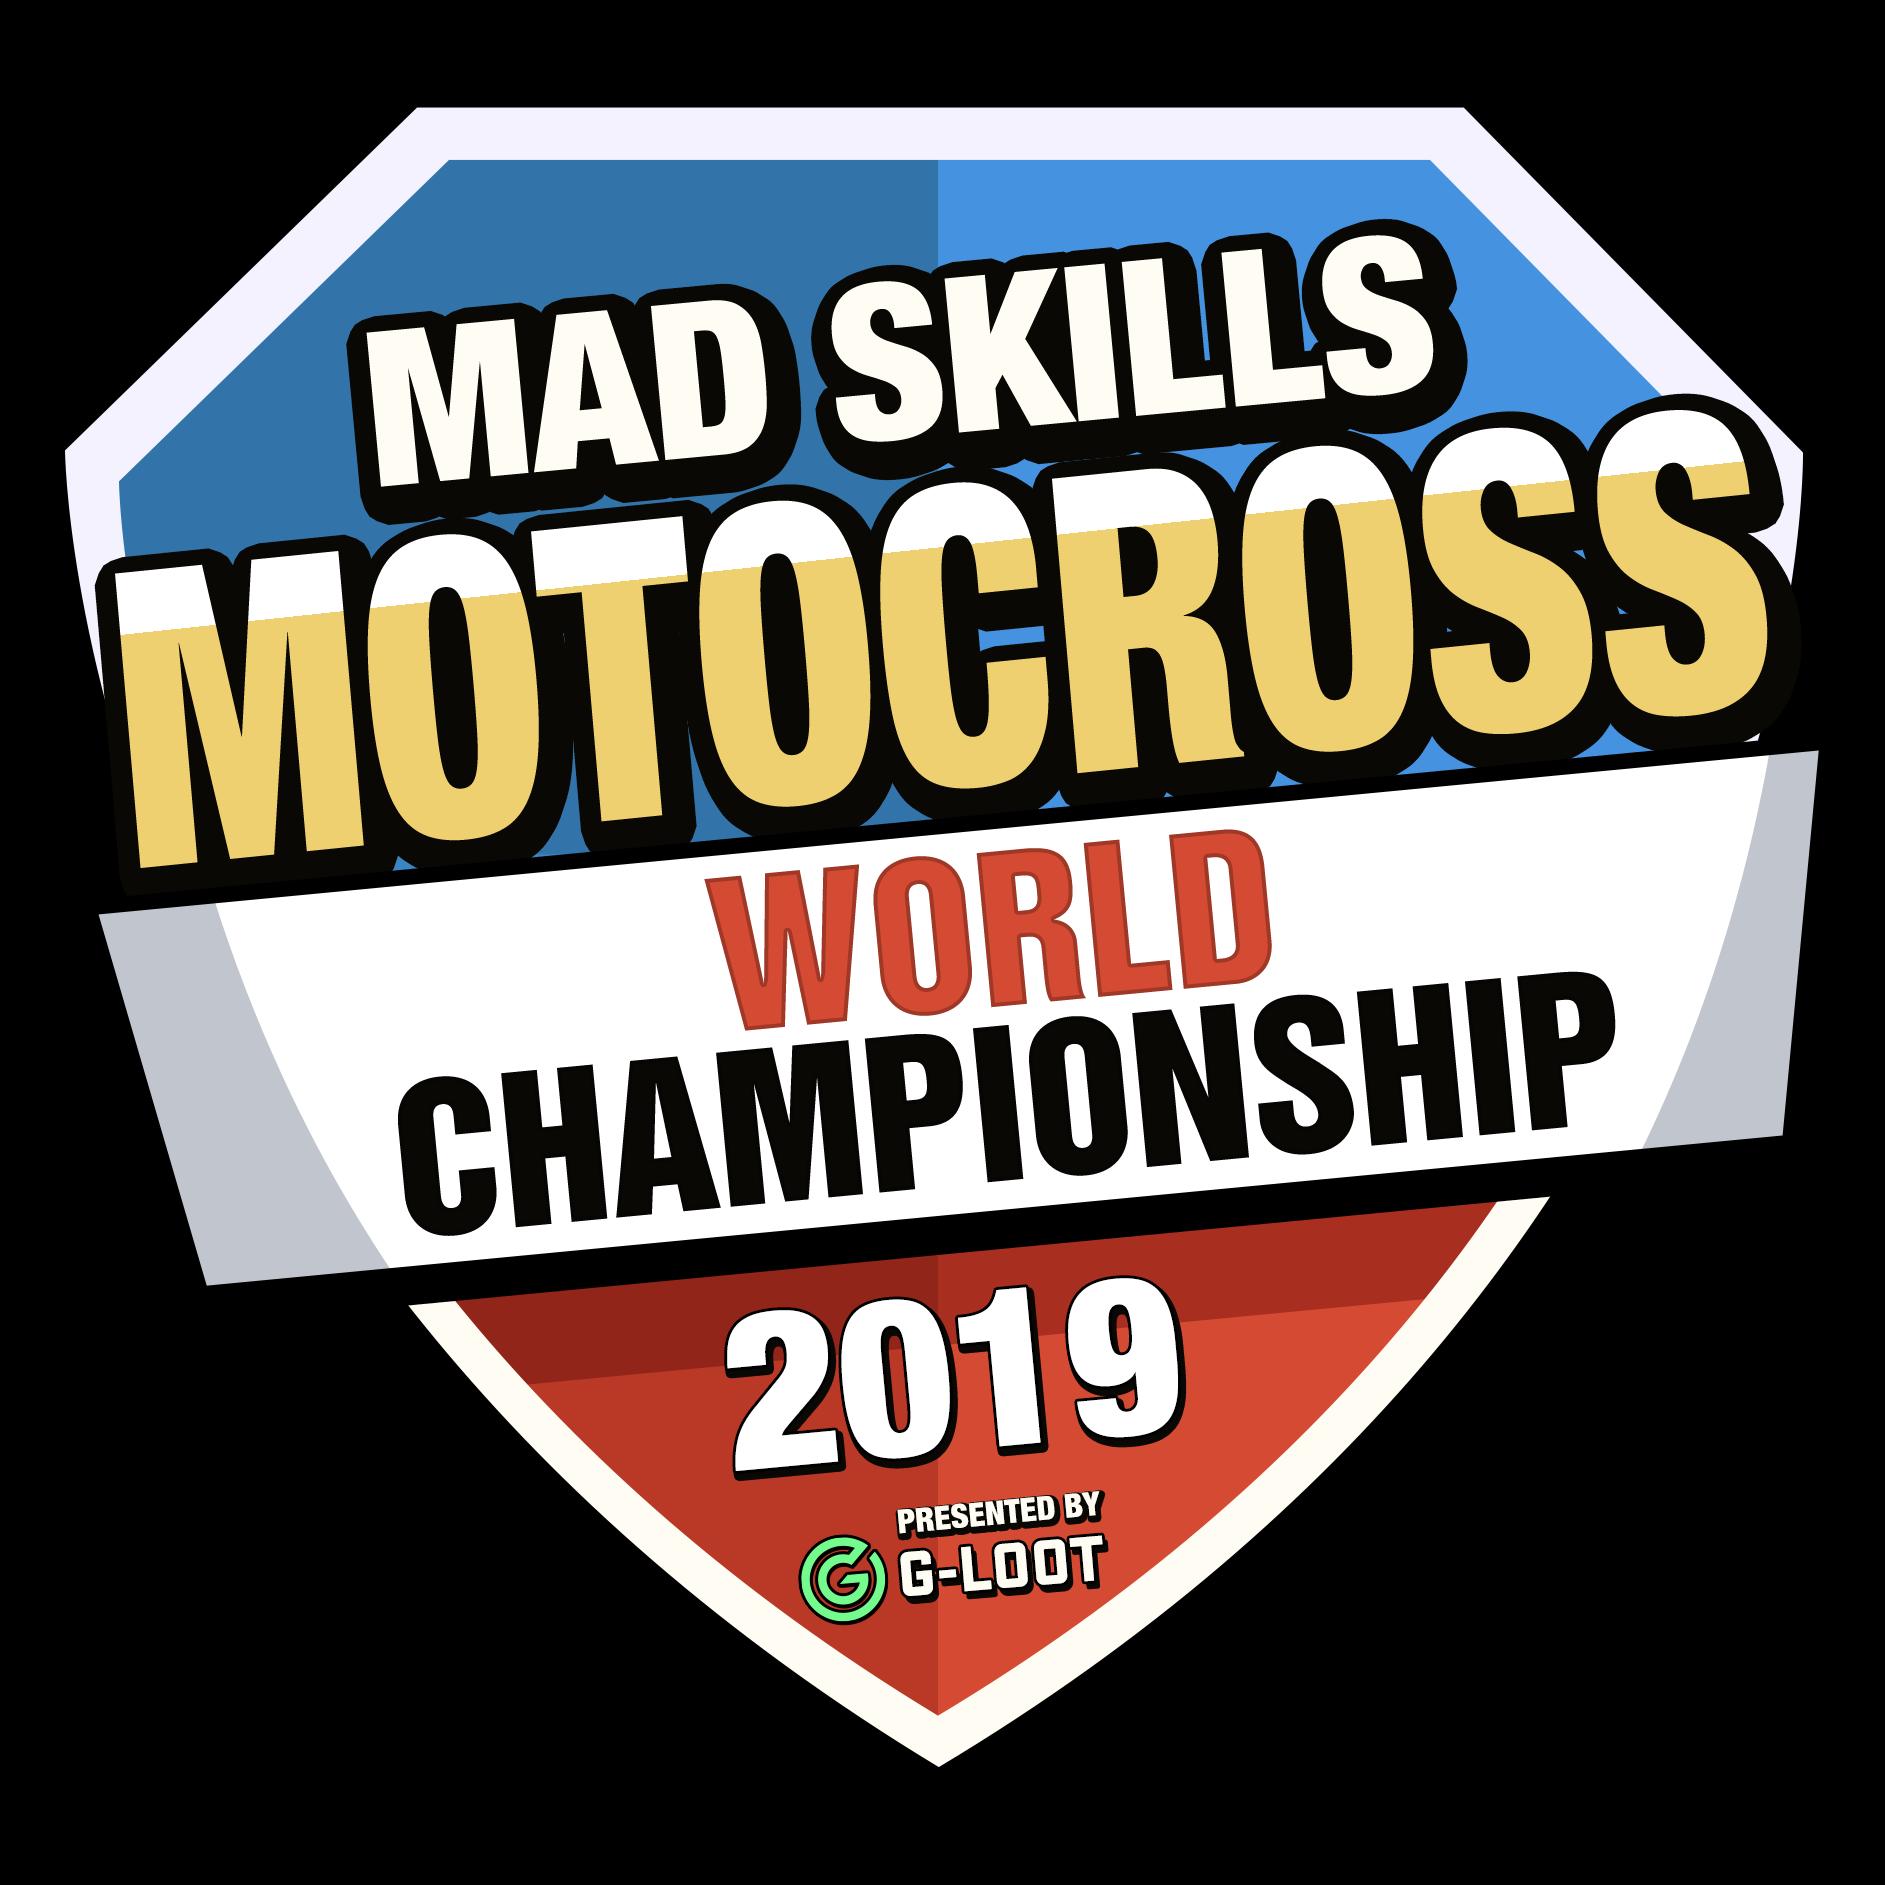 World Championship 2019.png